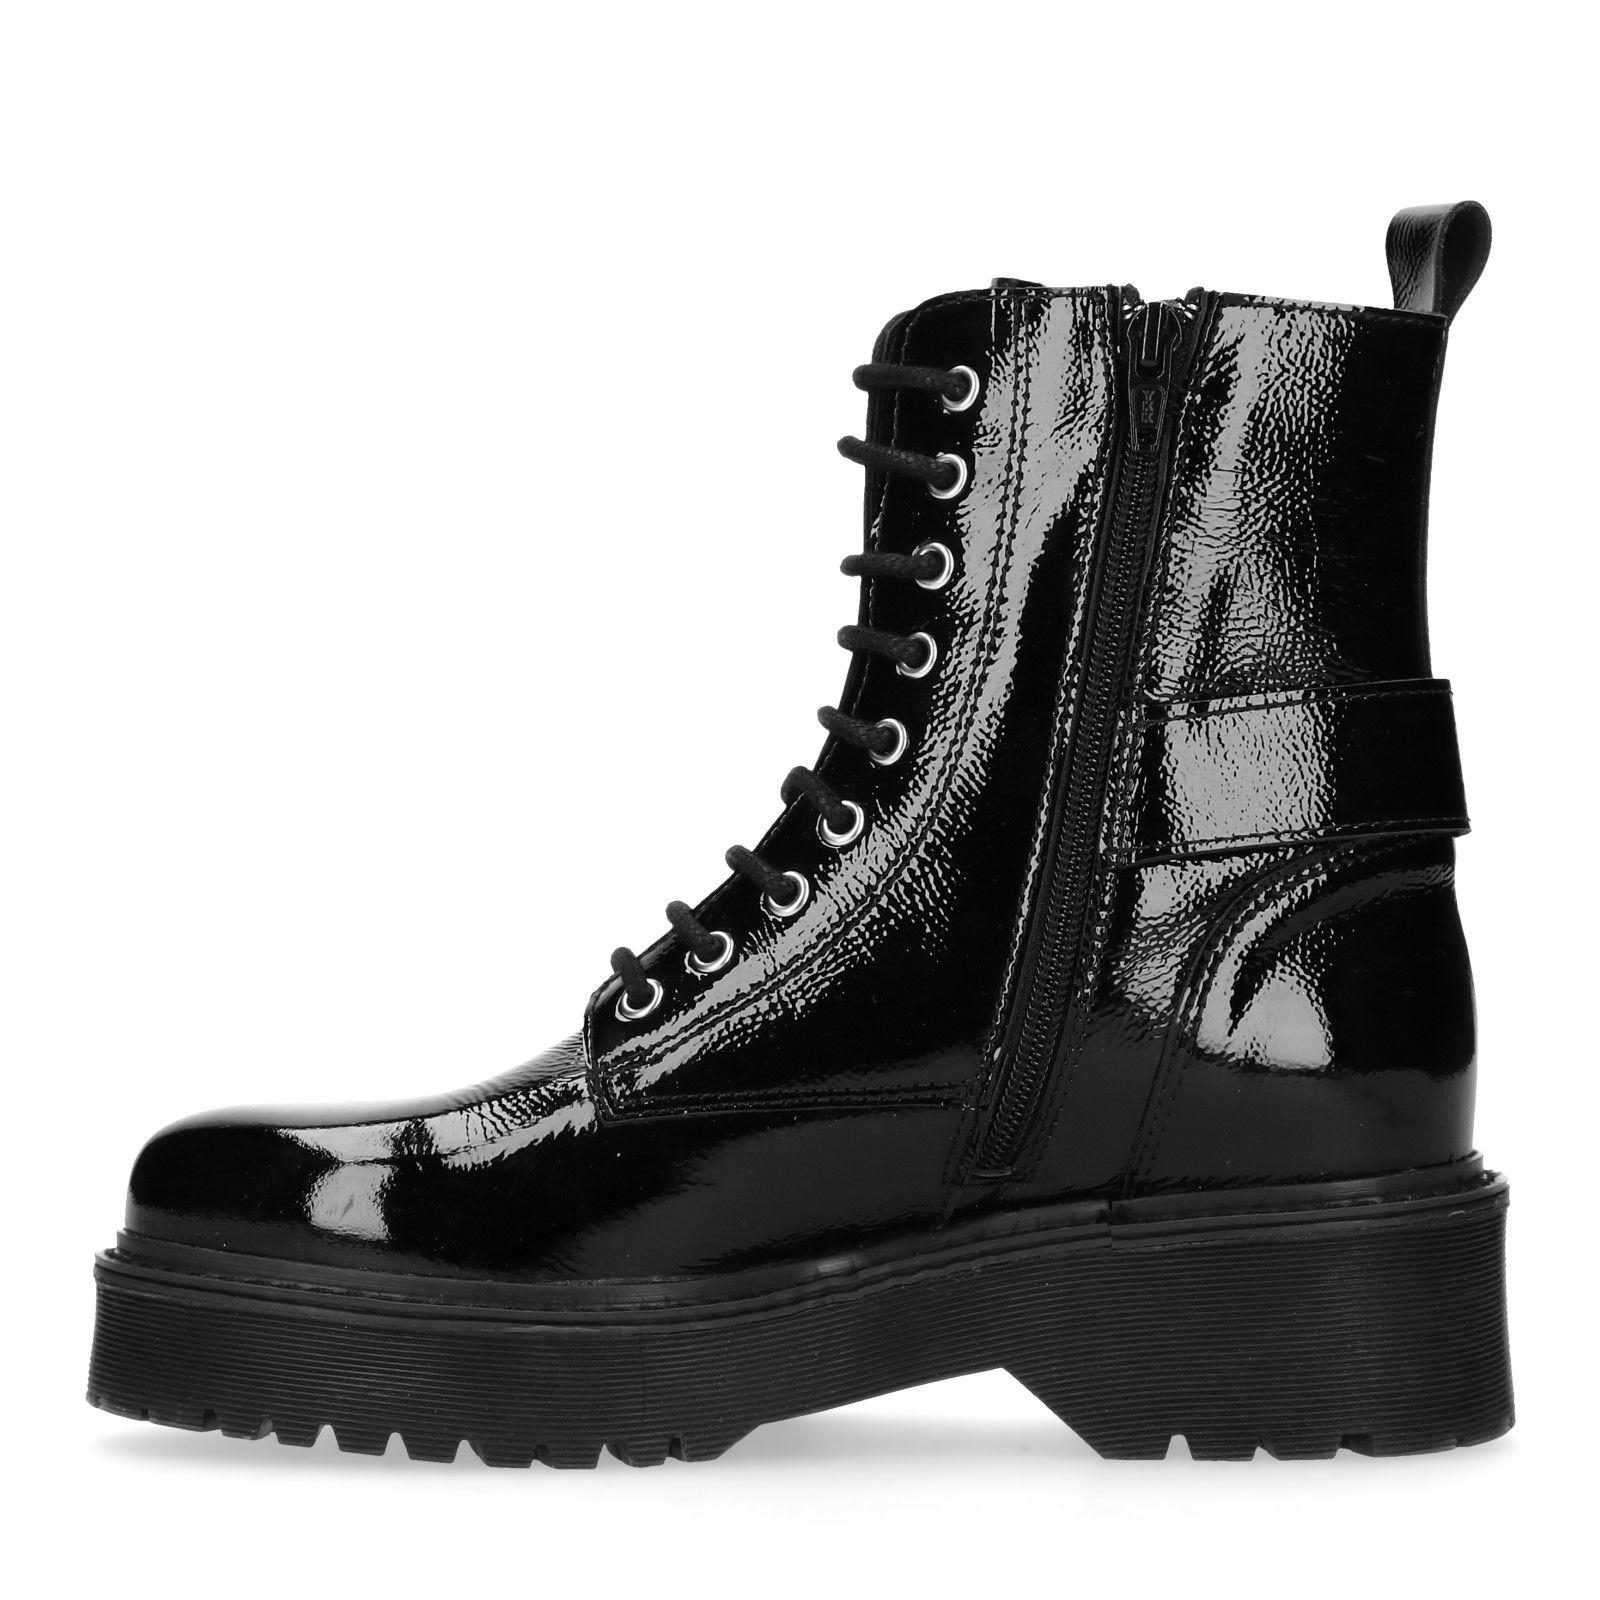 Lack Mit Boots Boots Schwarze Lack Mit Schwarze Schnalle 3qR4L5Aj